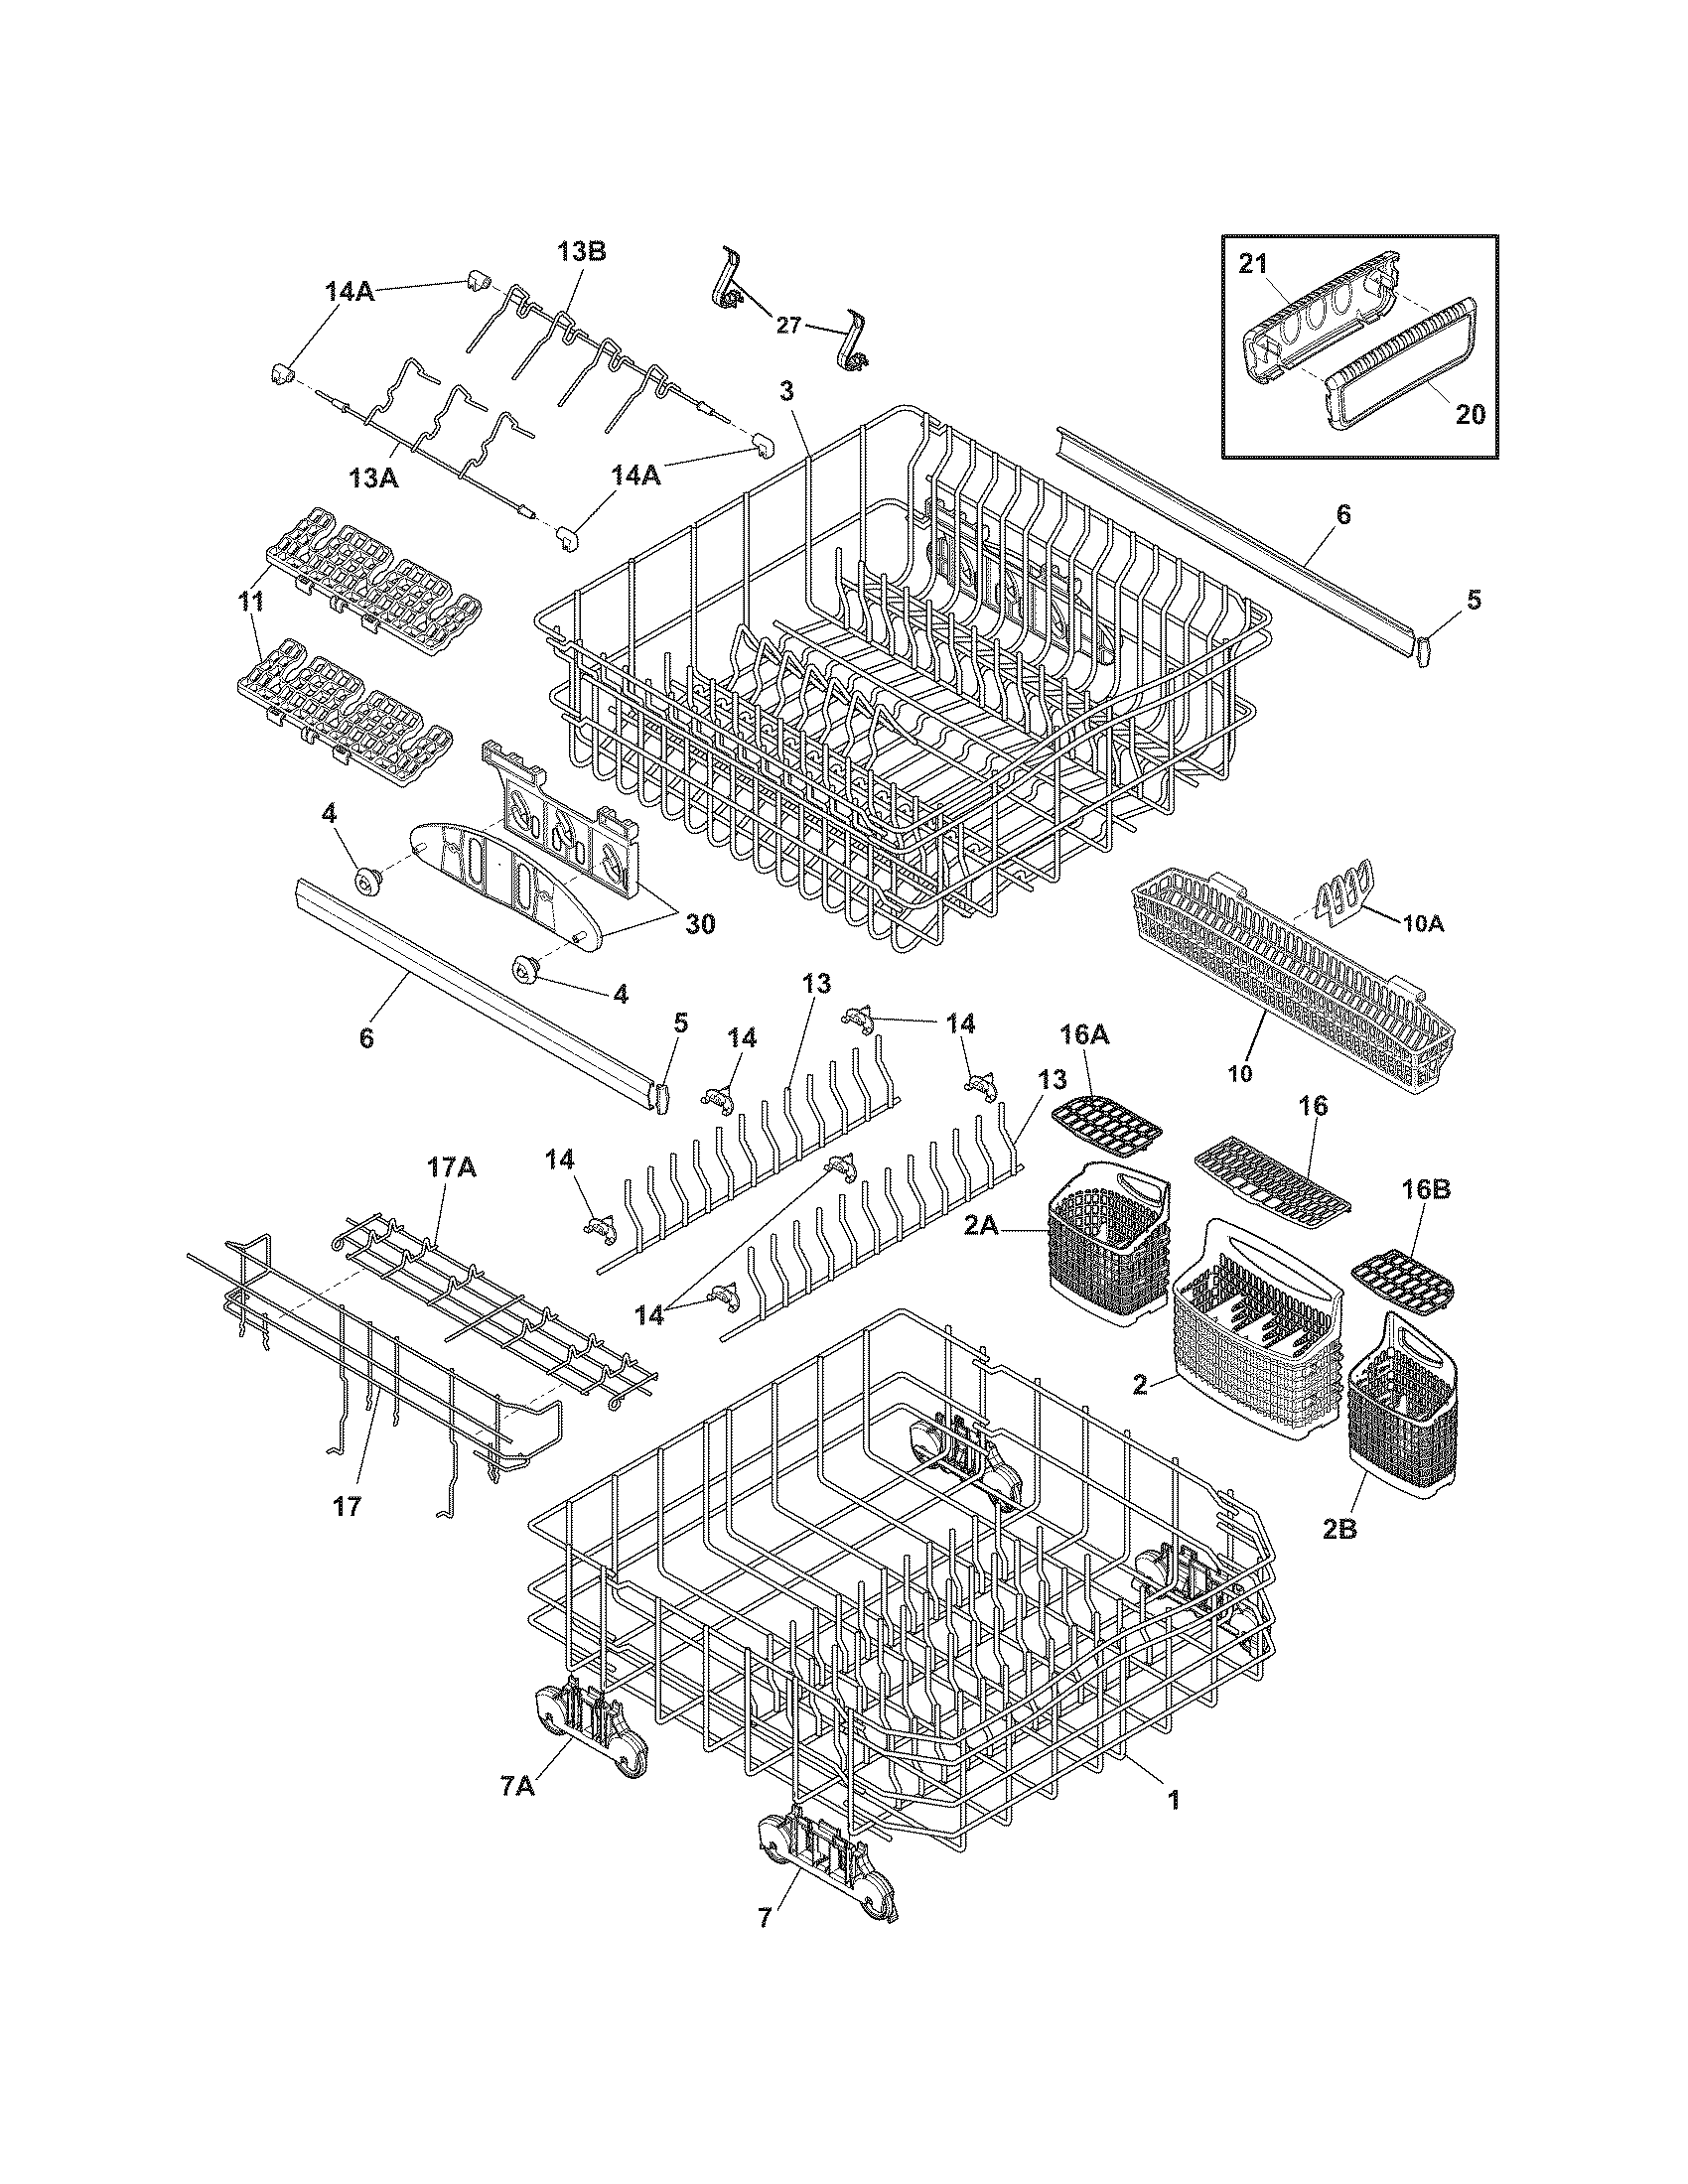 frigidaire gallery dishwasher parts diagram kenwood kdc 352u wiring door model fphd2481kf1